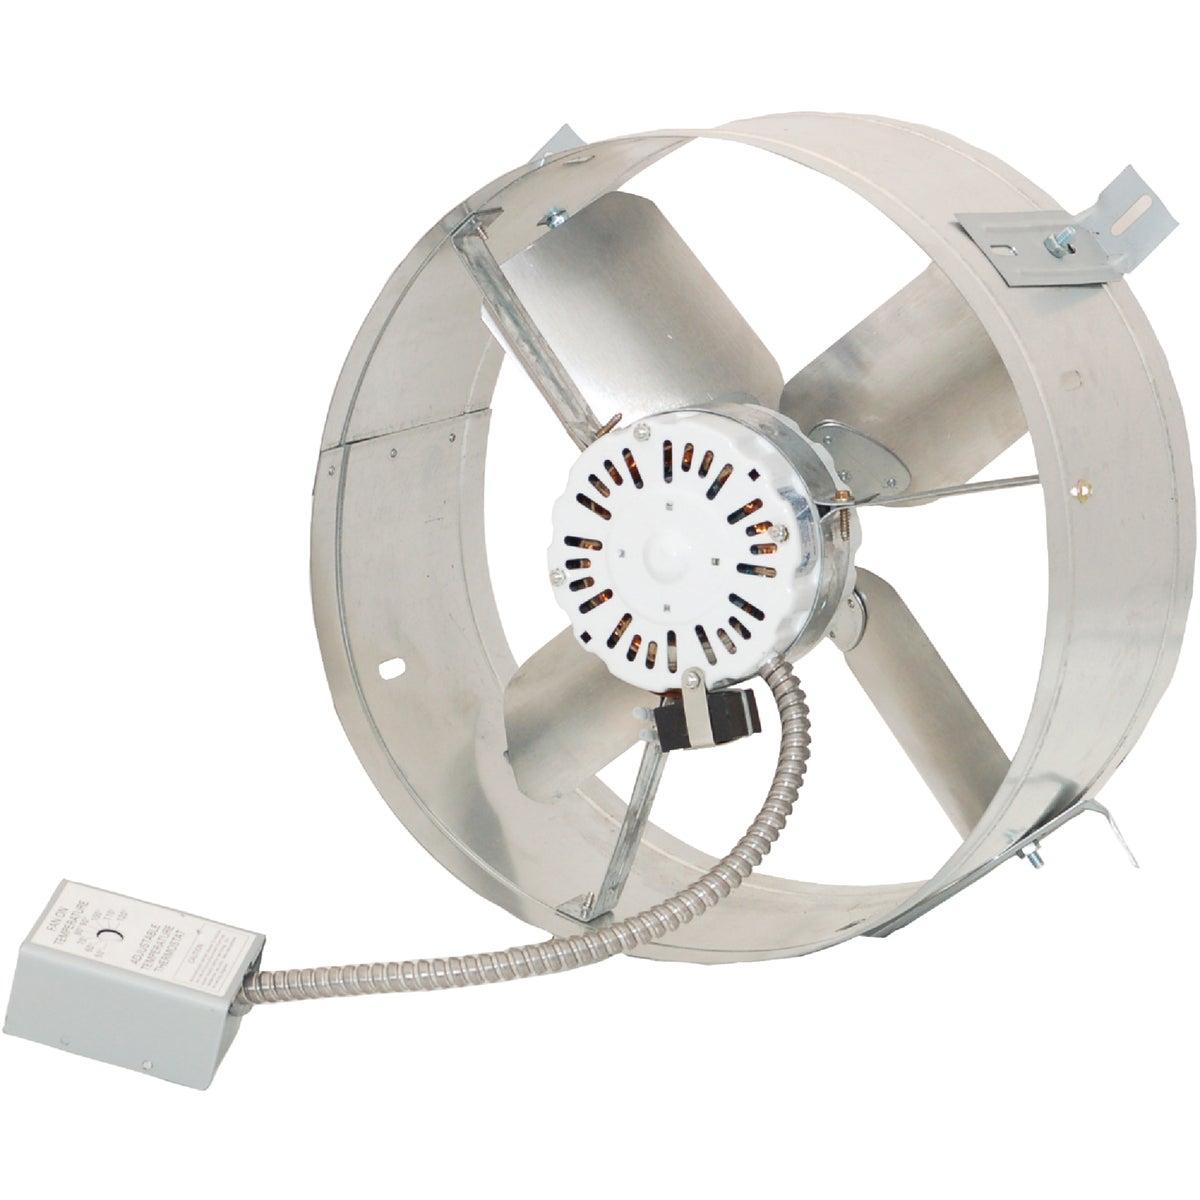 GABLE MNT PWR ATTIC VENT - CX2500 by Ventamatic Ltd